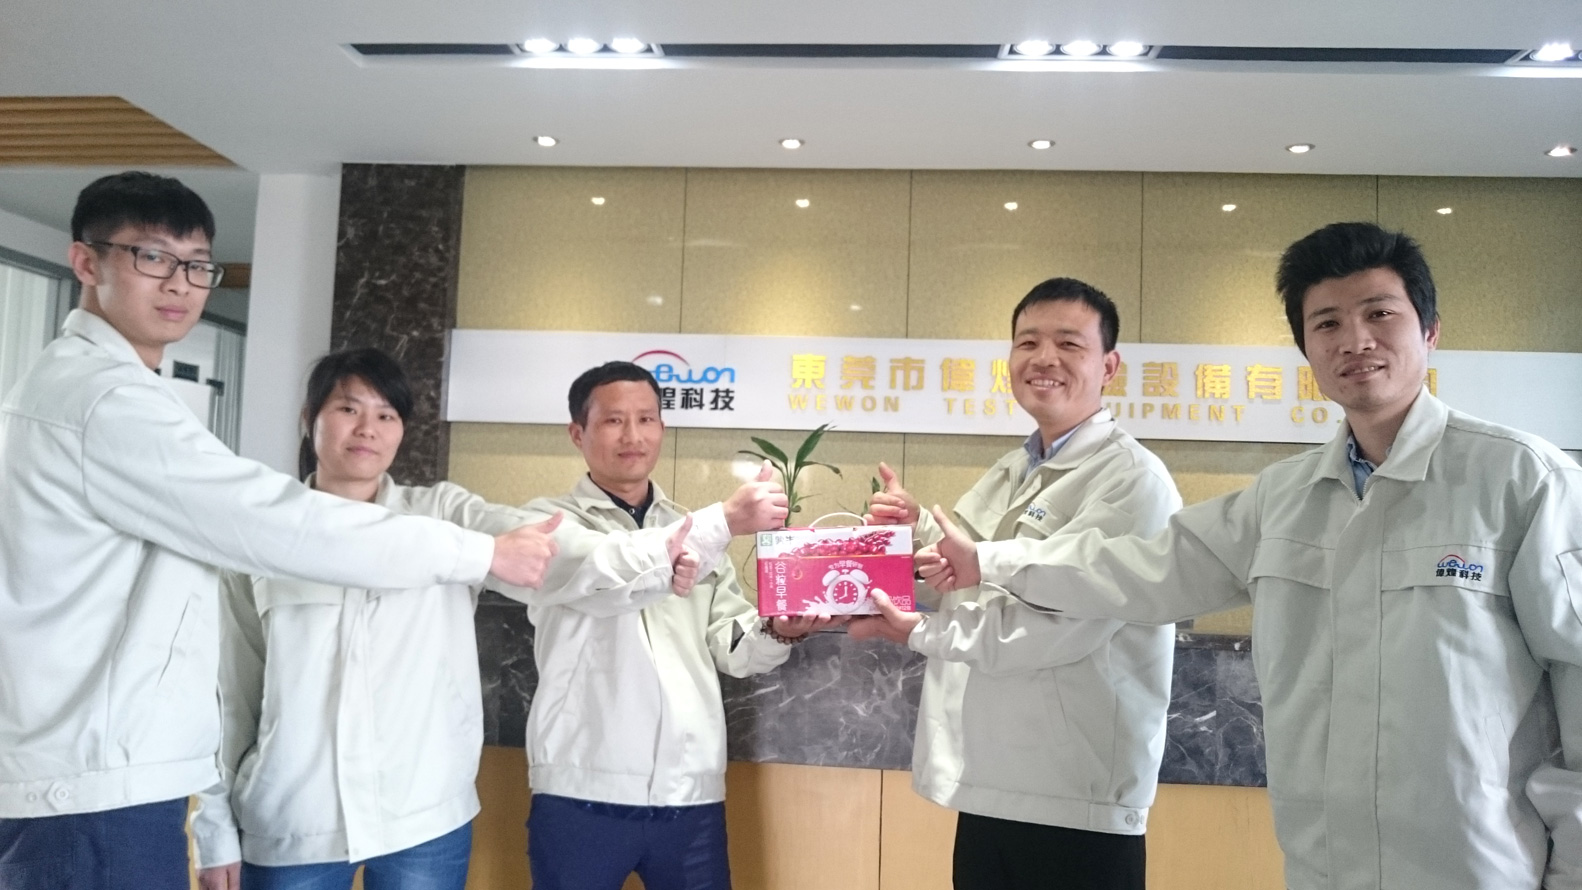 Encourage Reward Wewon Employee